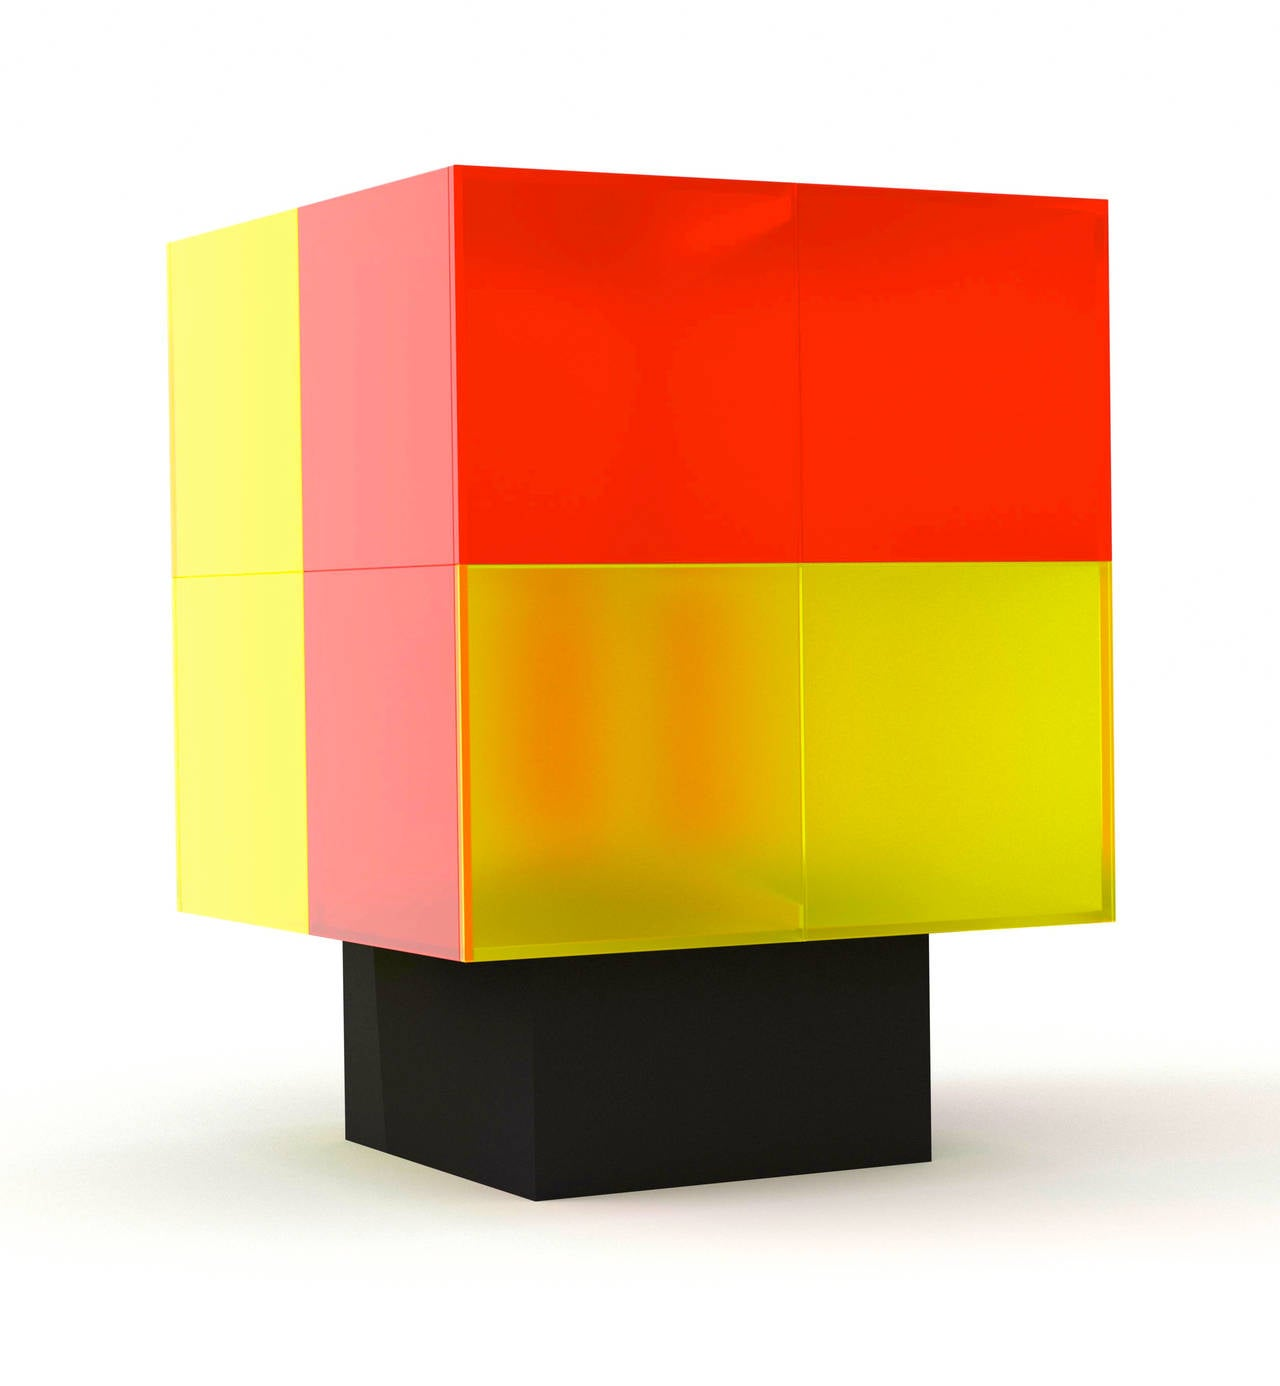 Illumetric: Cube